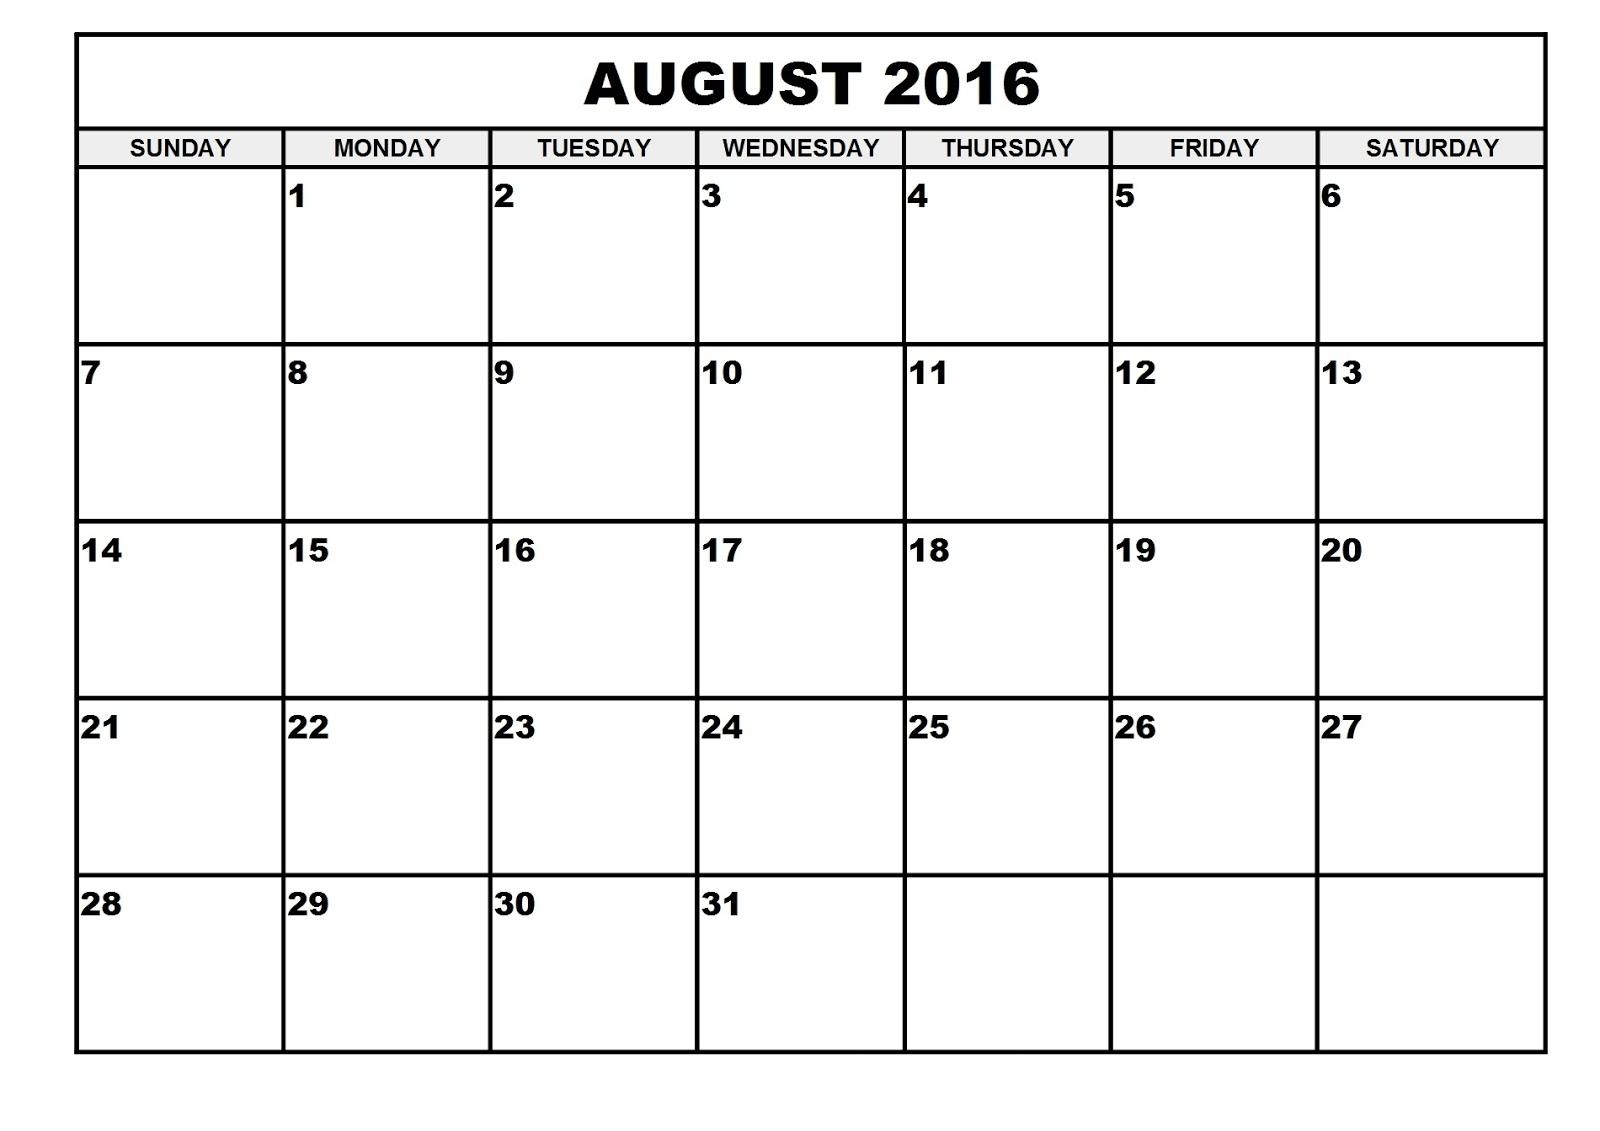 2016 Monthly Blank Calendar: August 2016 Printable